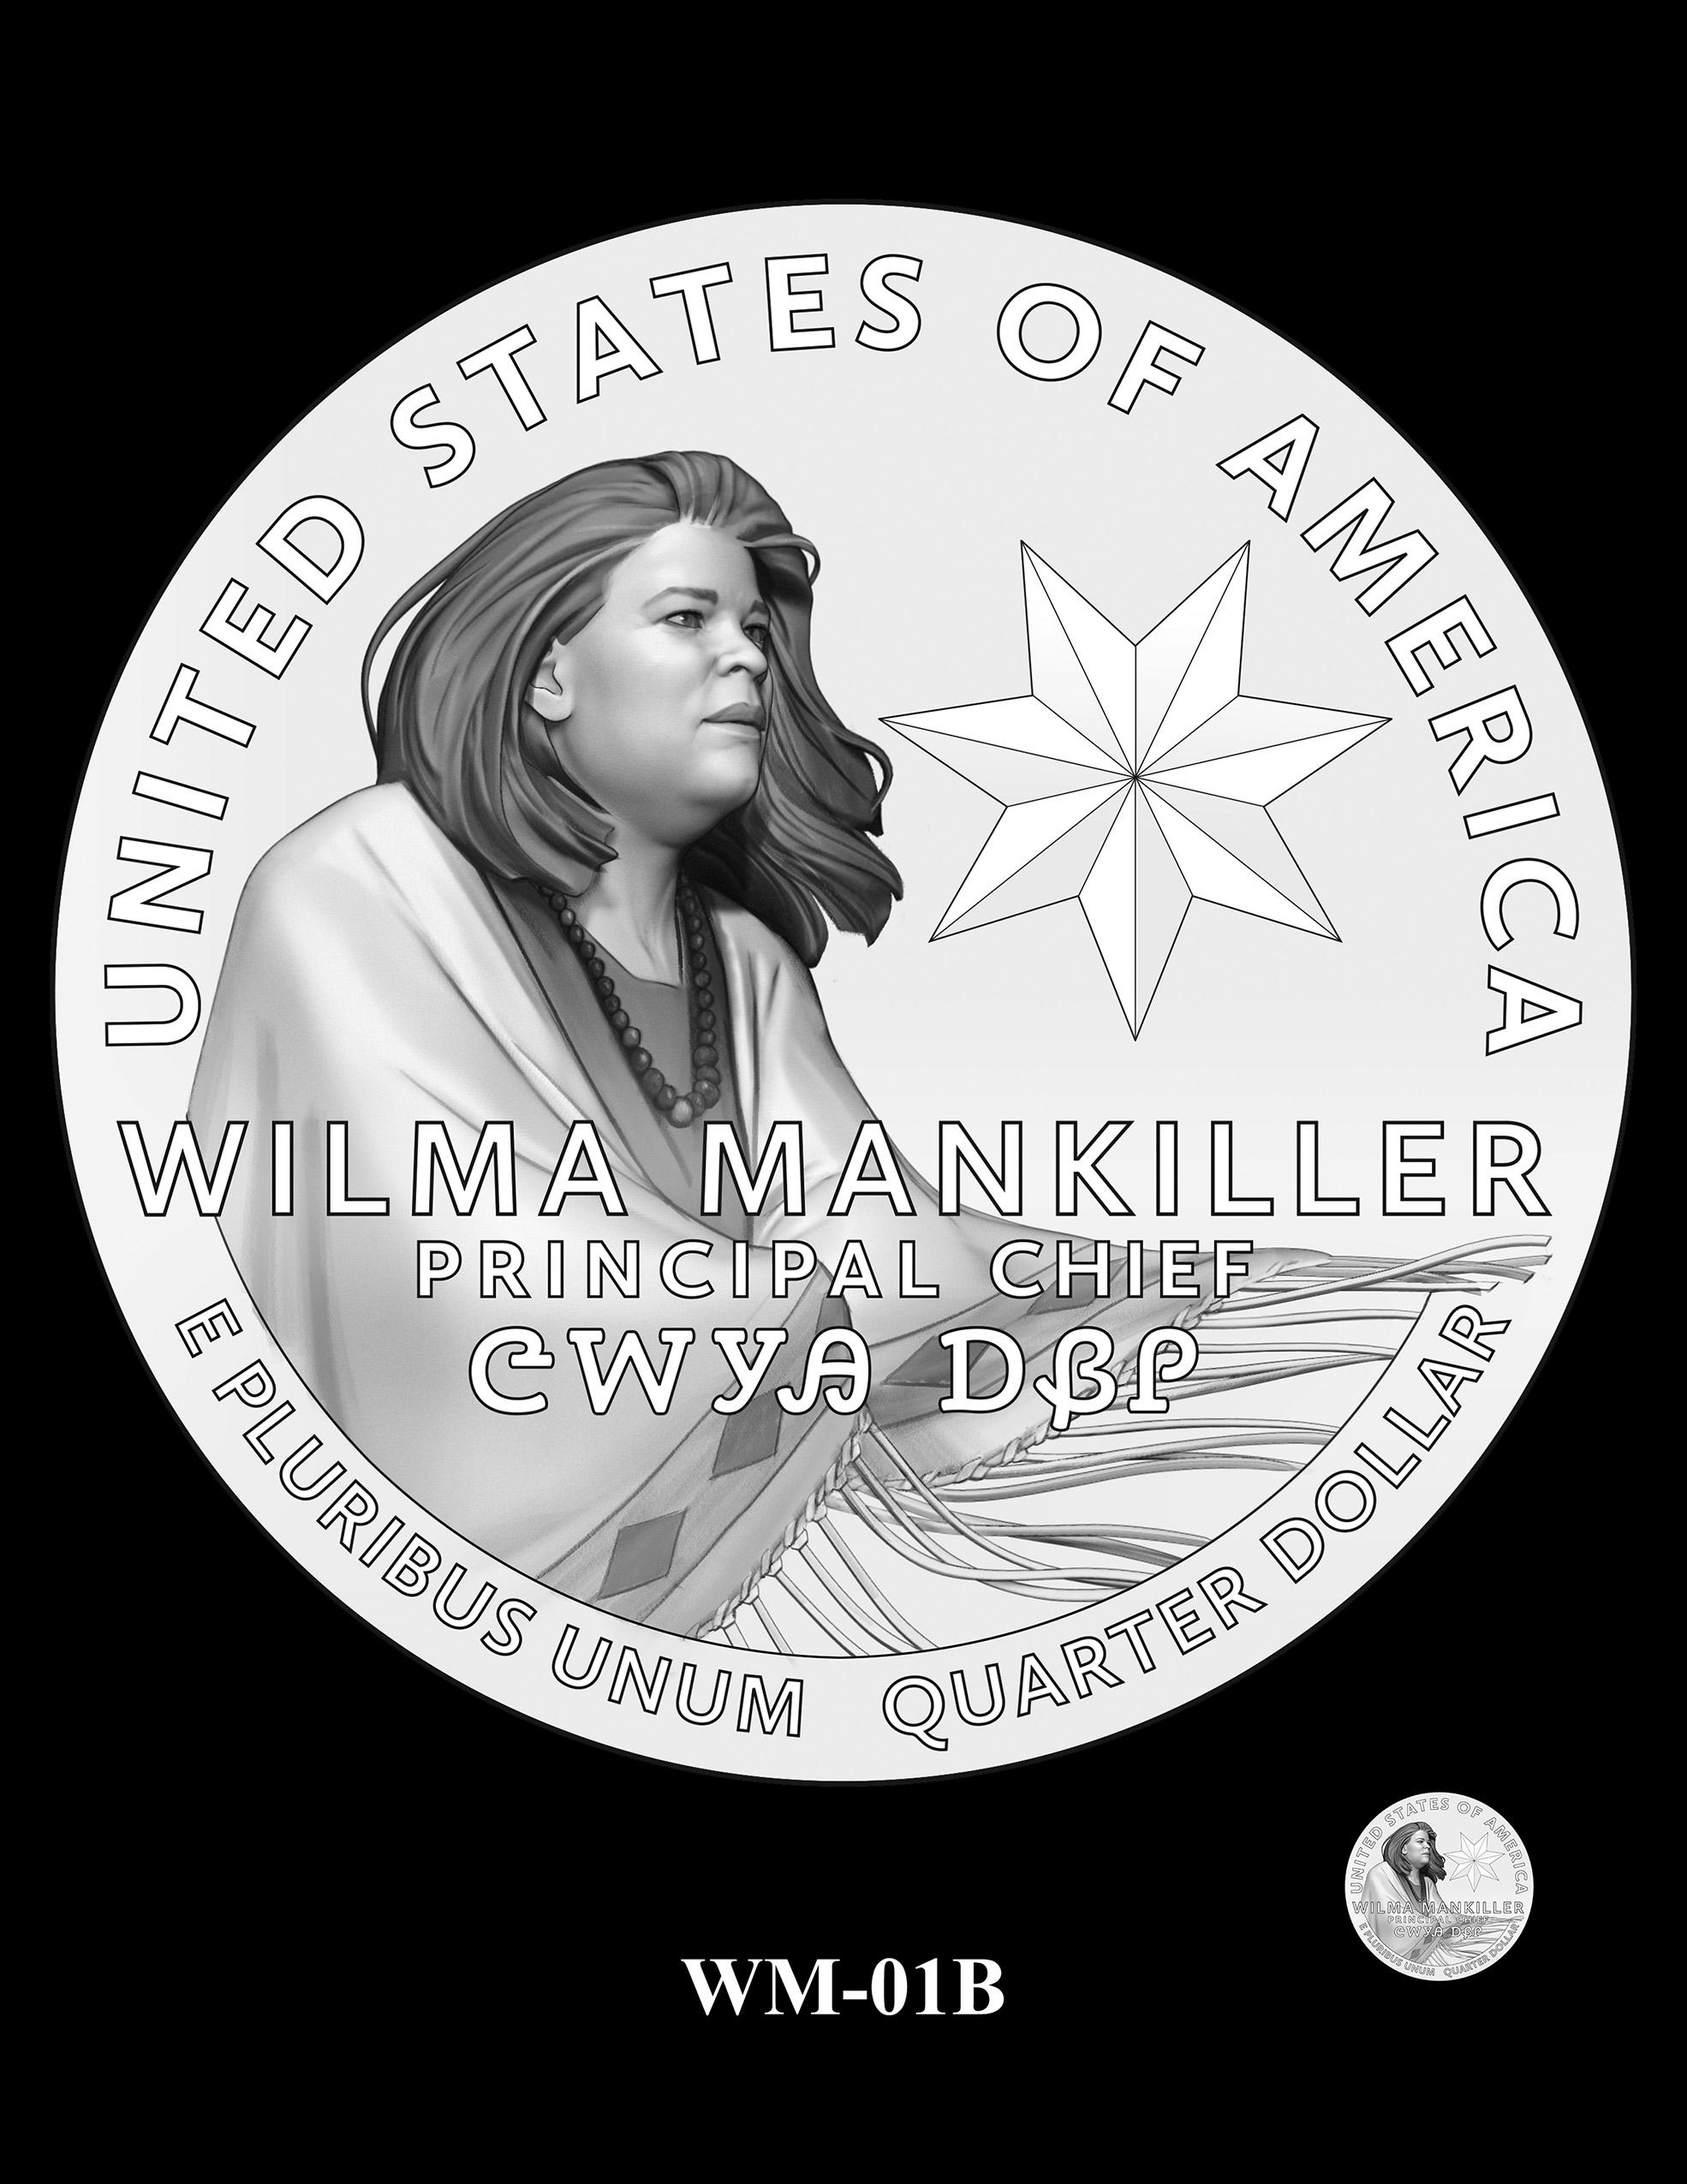 WM-01B -- 2022 American Women Quarters - Wilma Mankiller